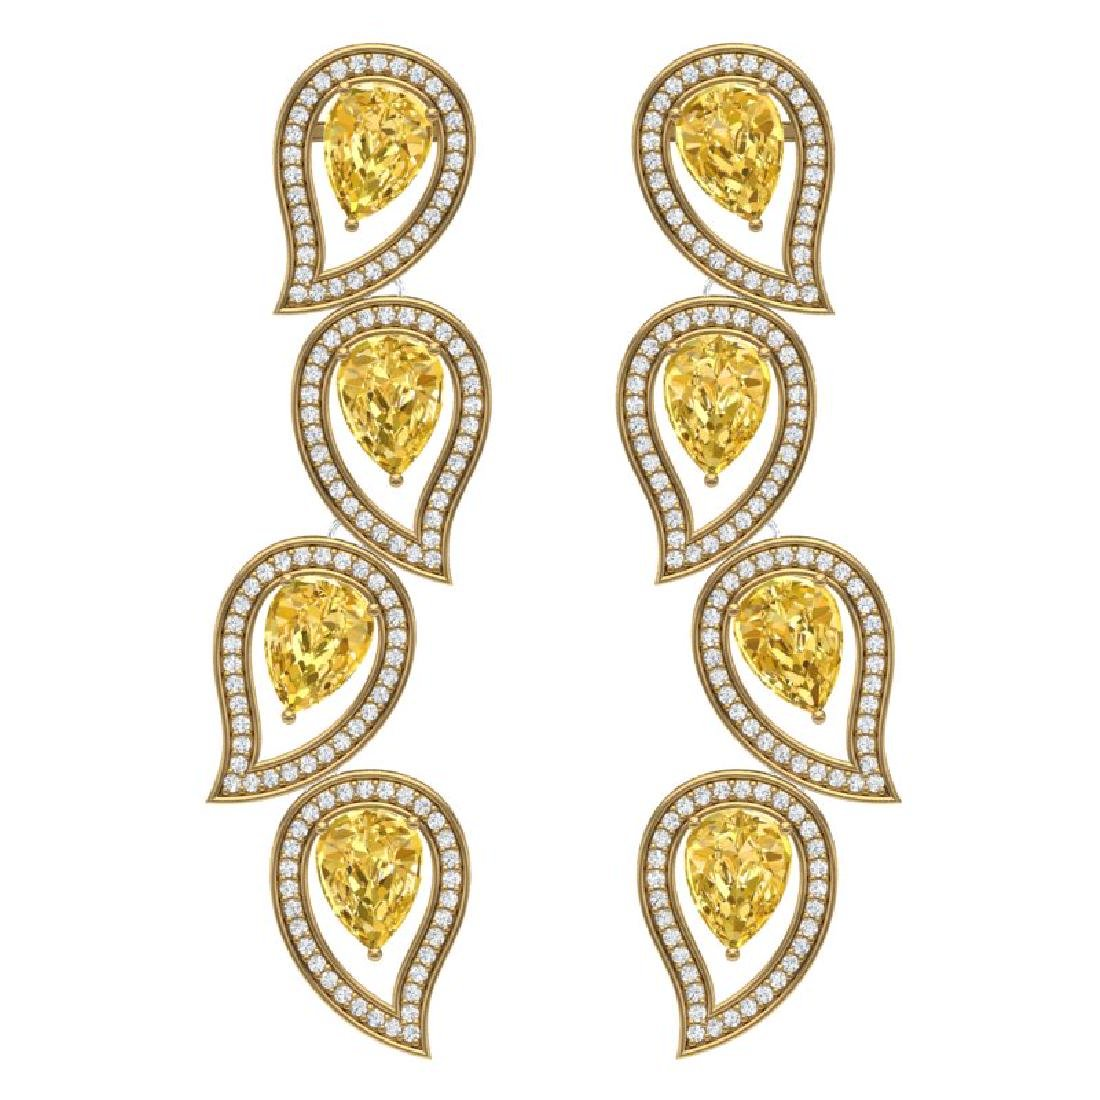 14.63 CTW Royalty Canary Citrine & VS Diamond Earrings